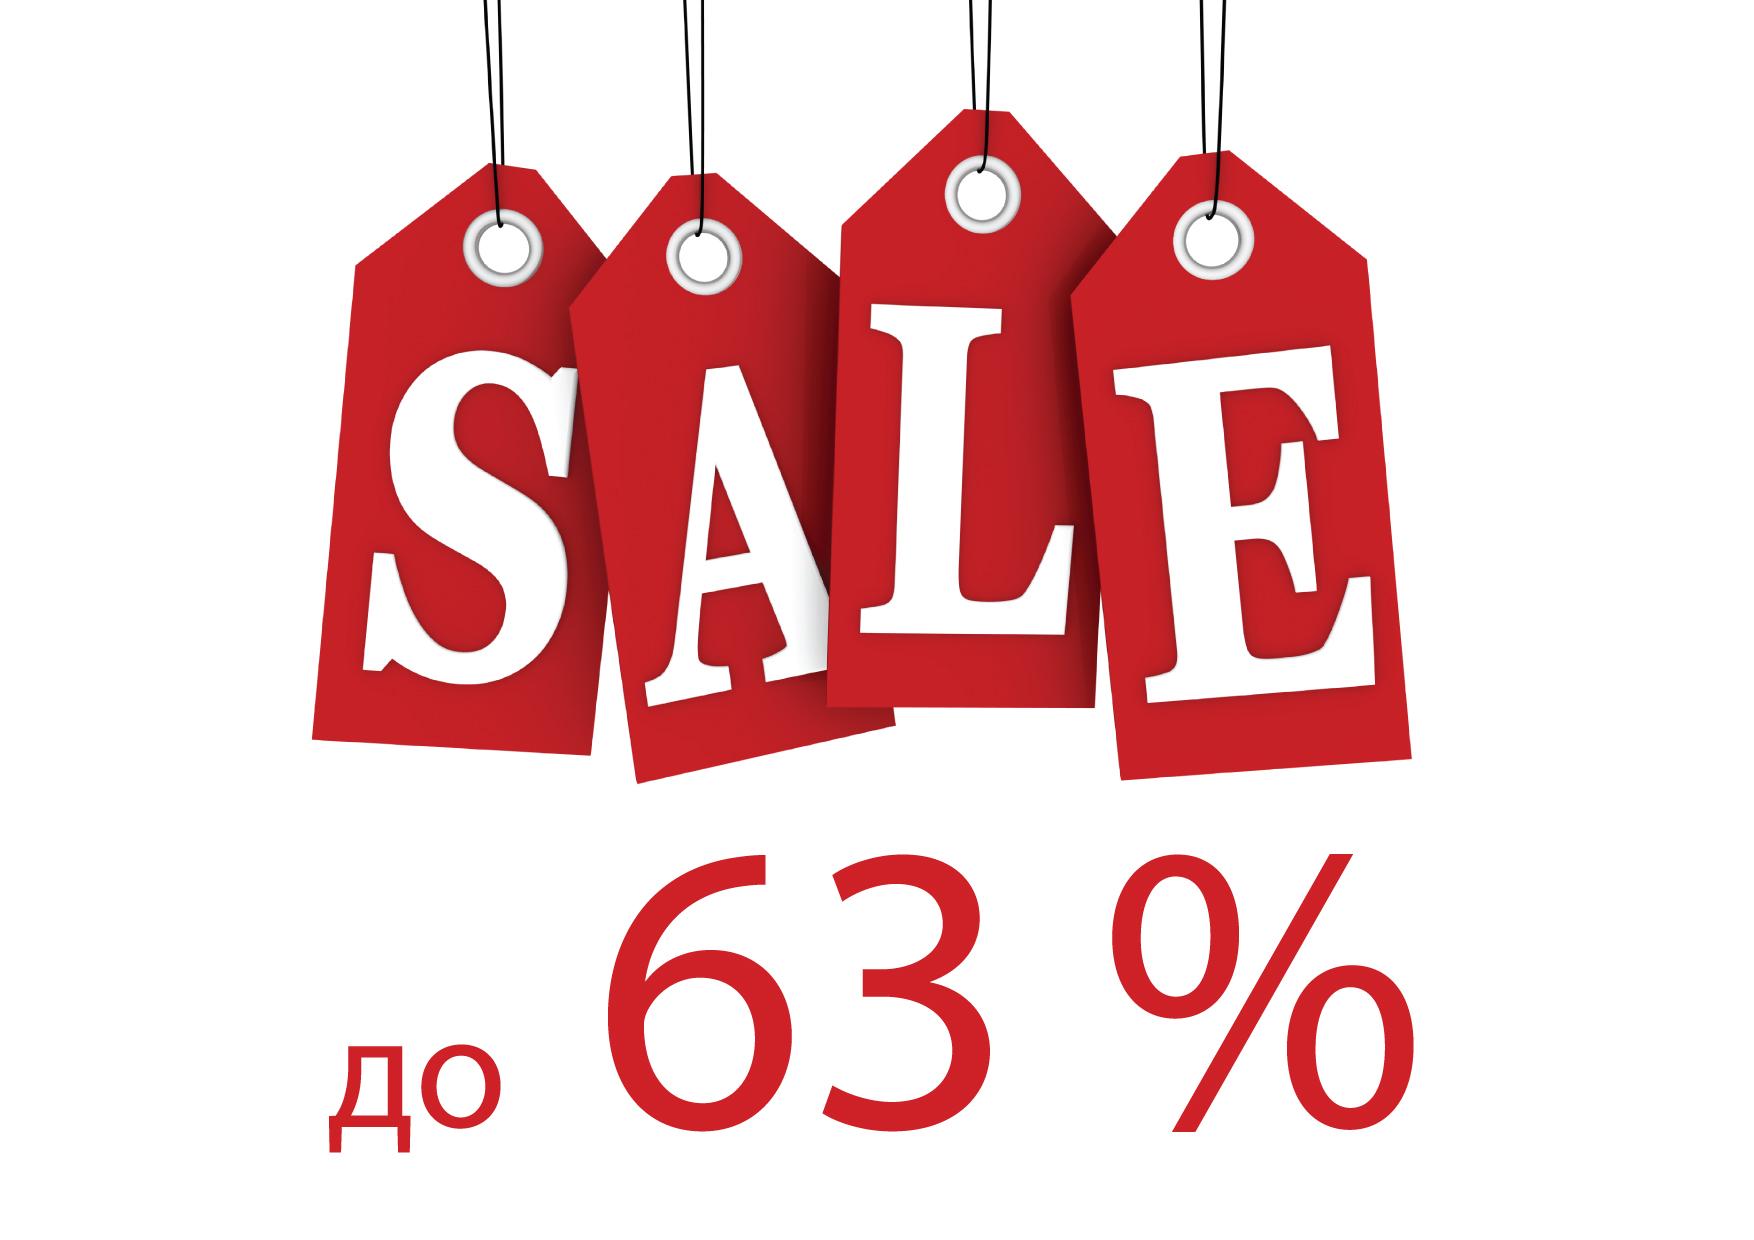 Новогодняя распродажа Orthomol со скидкой до 63%